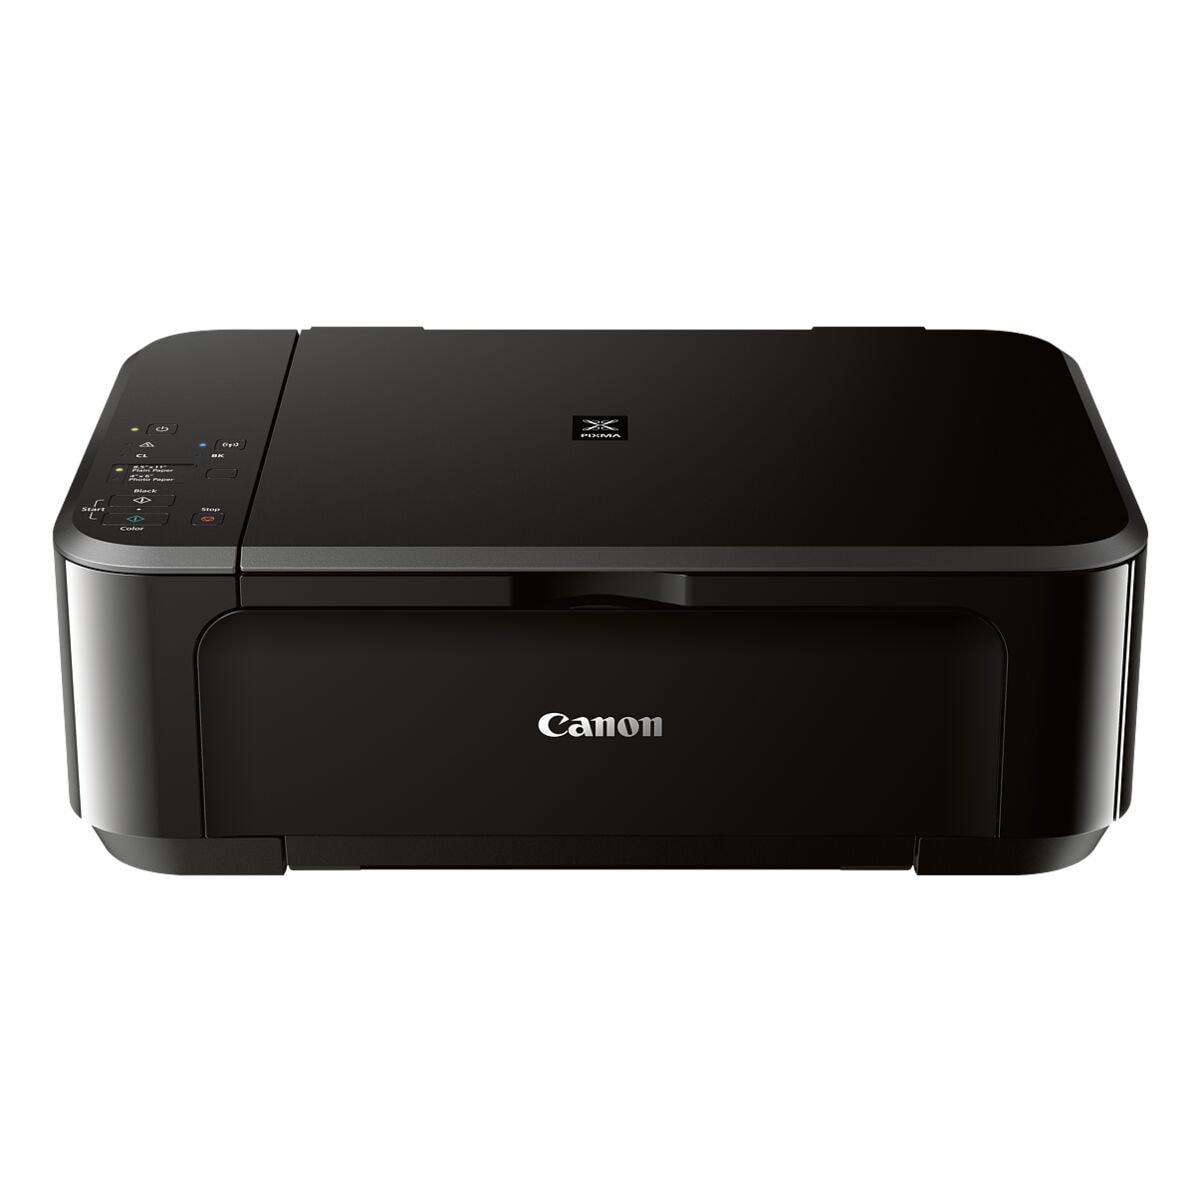 Canon Multifunktionsdrucker »PIXMA MG3650S« schwarz